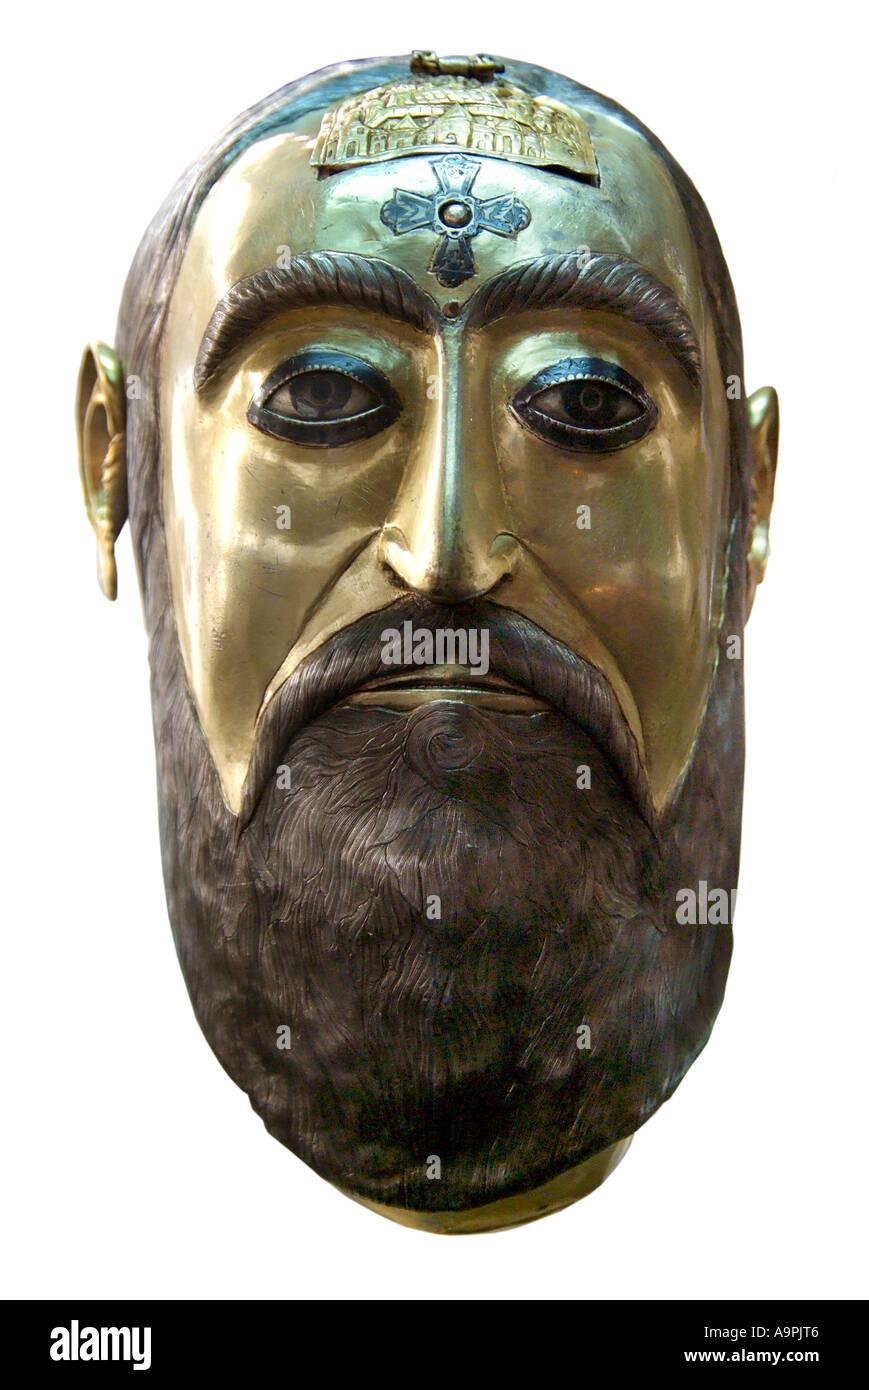 Gilt gold bronze face mask head Slavonic Russia Russian Bulgarian Serbian Serbo Croatia Croat Apostle Slav slavia treasure - Stock Image